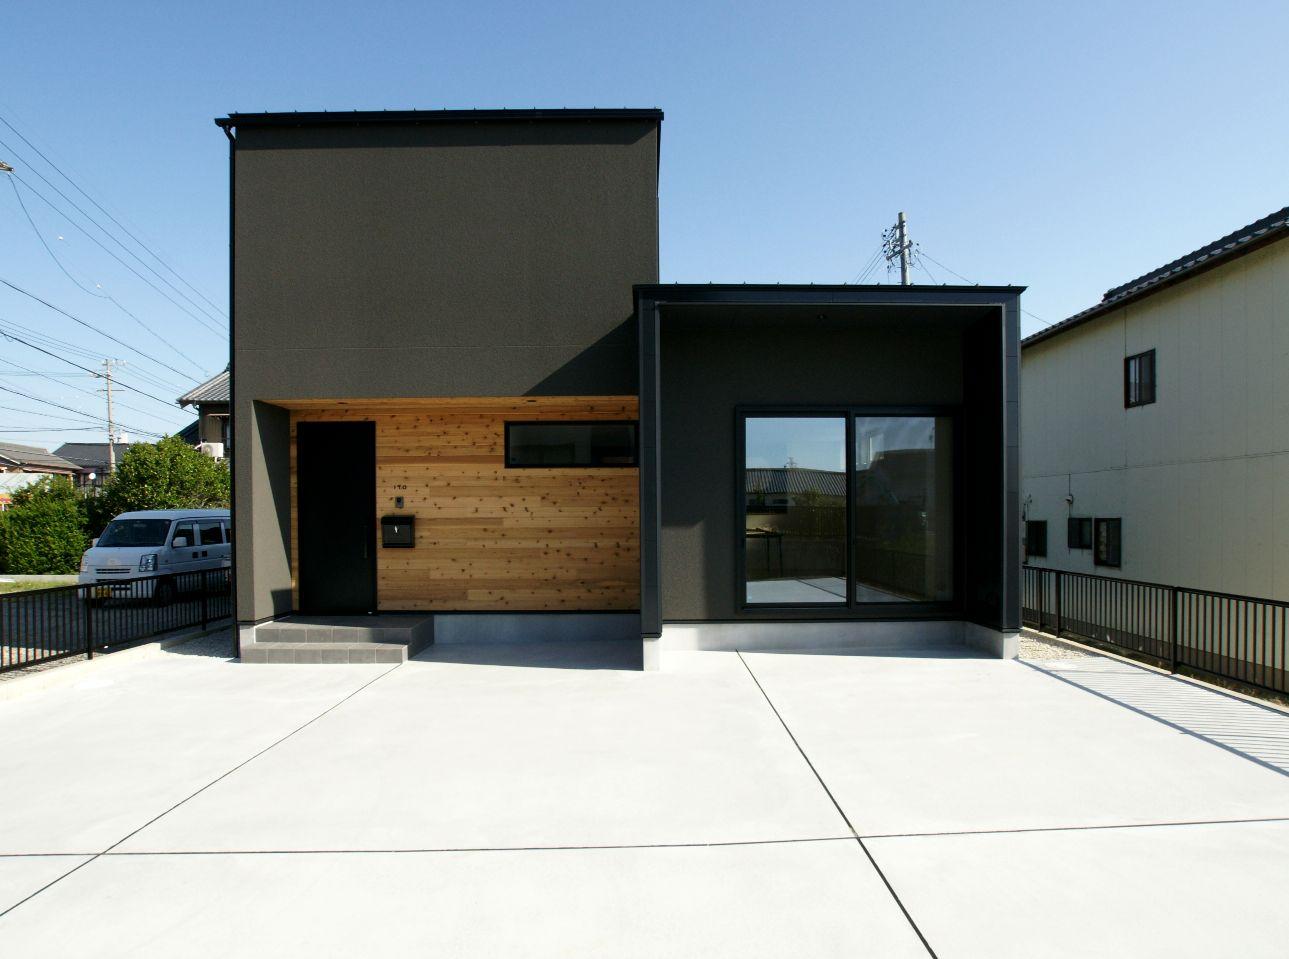 RIKYU (リキュー)【間取り、ペット、建築家】ブラックのサイディングに天然木のアクセントウォールが映える外観。2つの箱が並んだようなスタイリッシュなフォルムに、建築家住宅らしいオリジナリティが溢れている